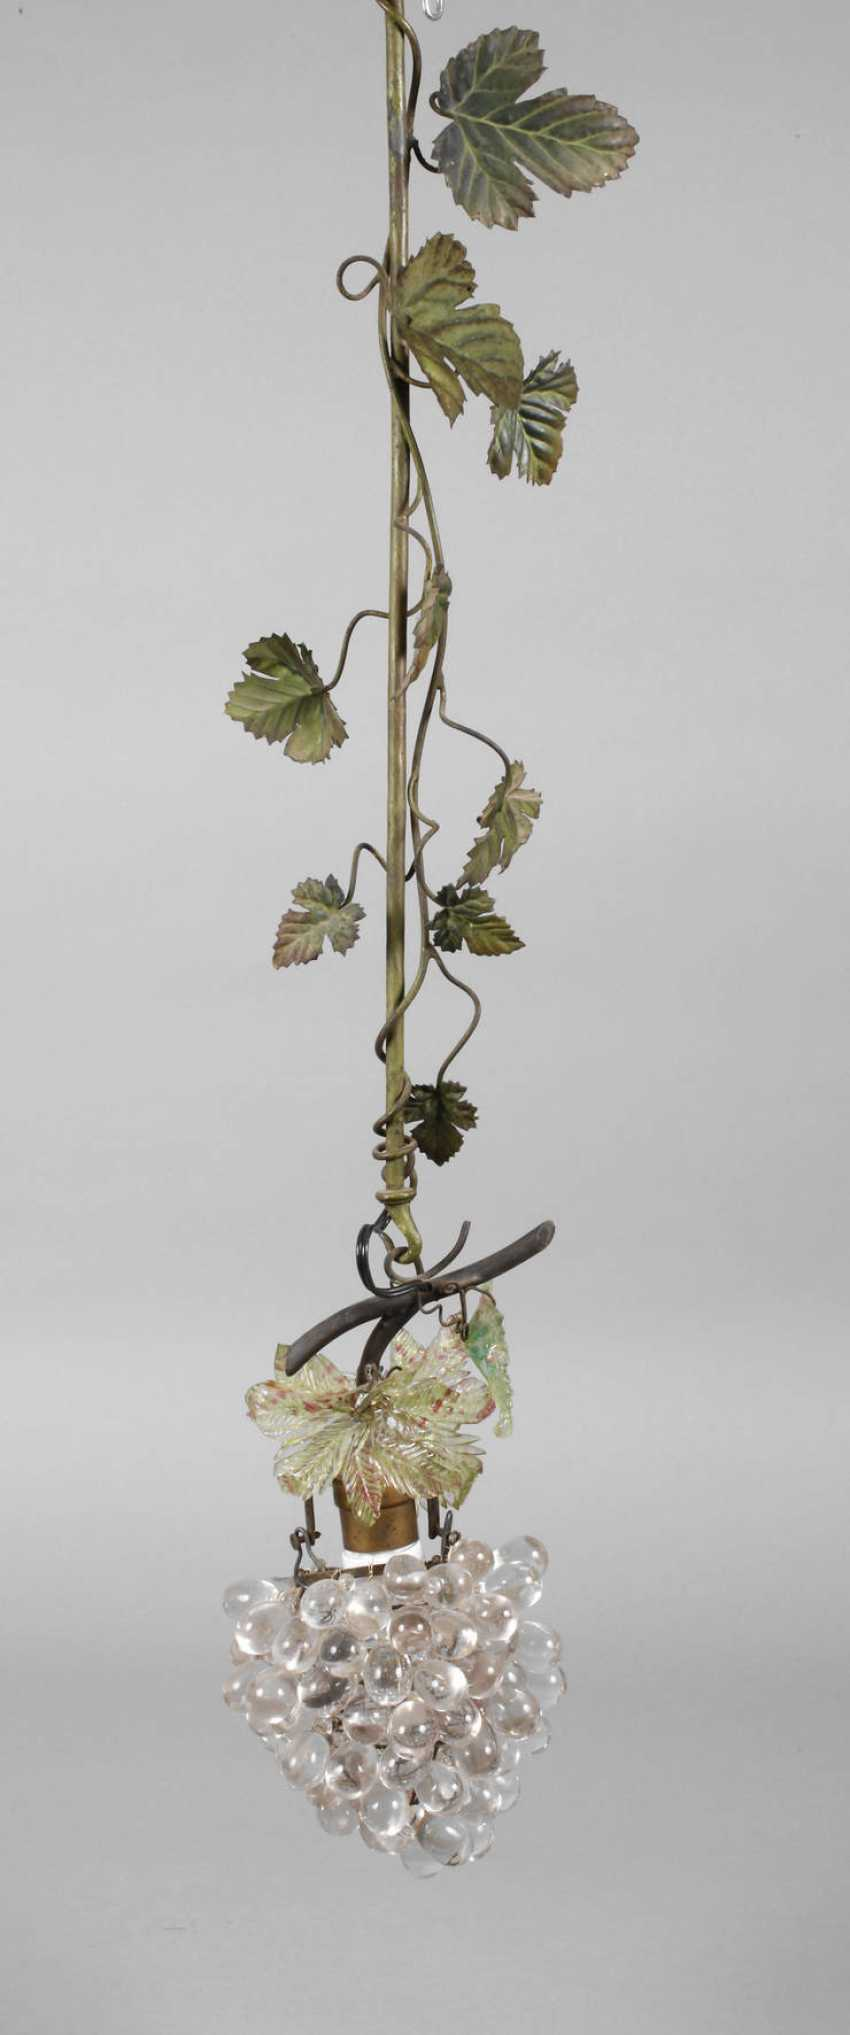 Ceiling lamp as a vine - photo 1